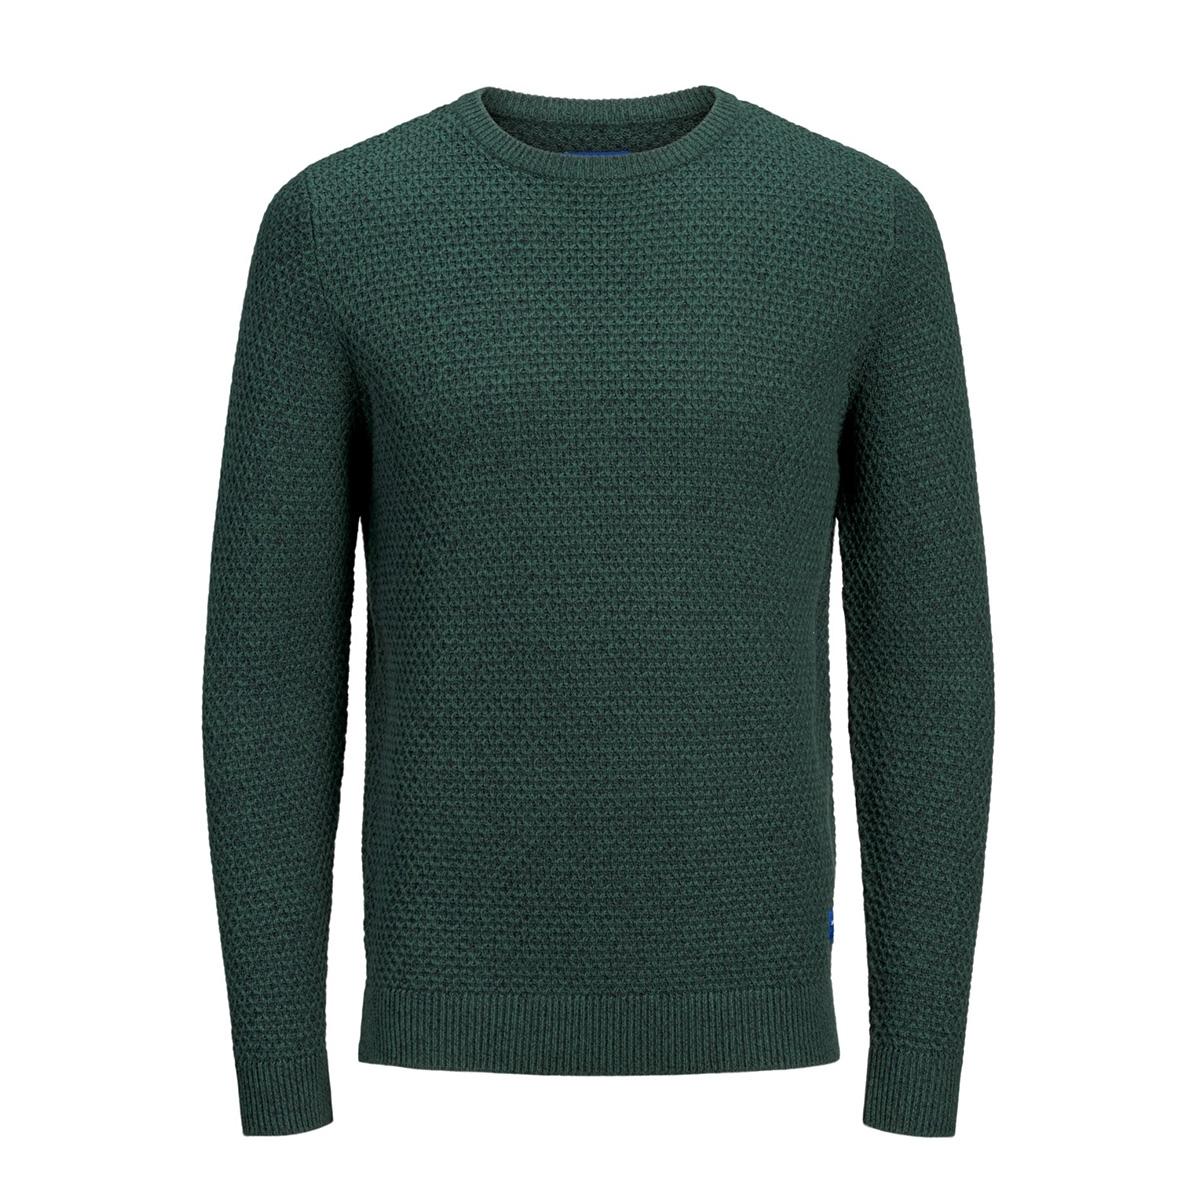 jorsilas knit crew neck 12162249 jack & jones trui sea moss/knit fit